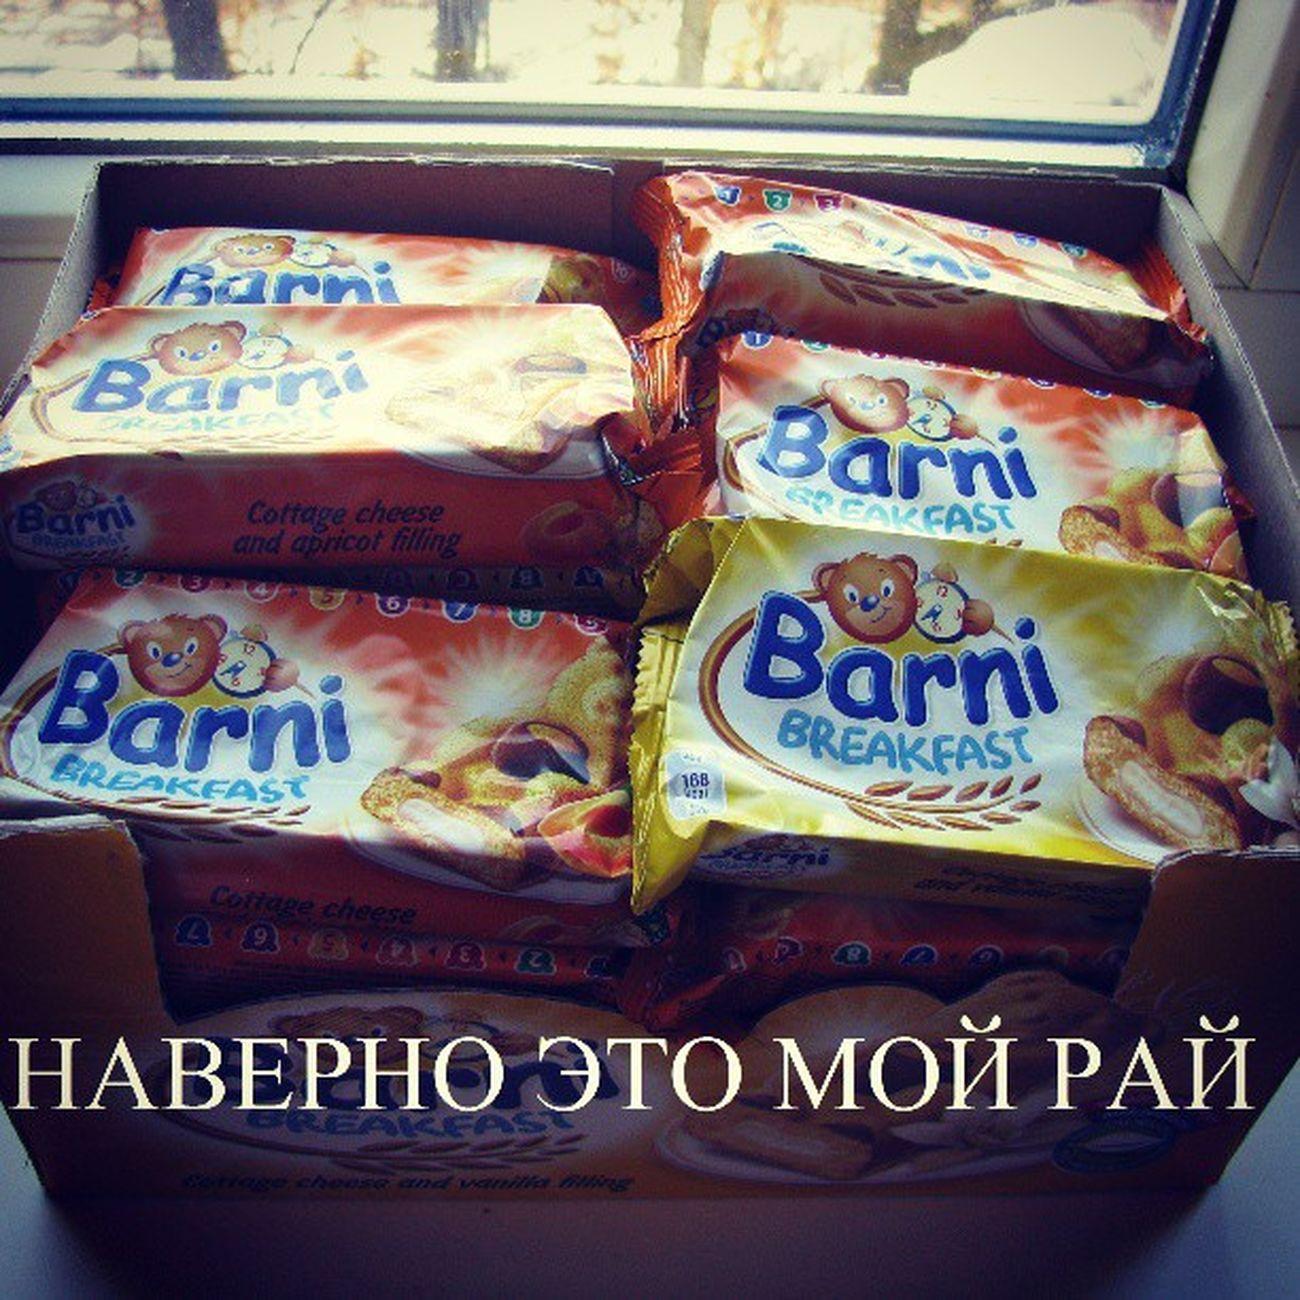 Barni Bear Omnomnom Photo present sweet nice swag cookies instagram eat instagood bestgram